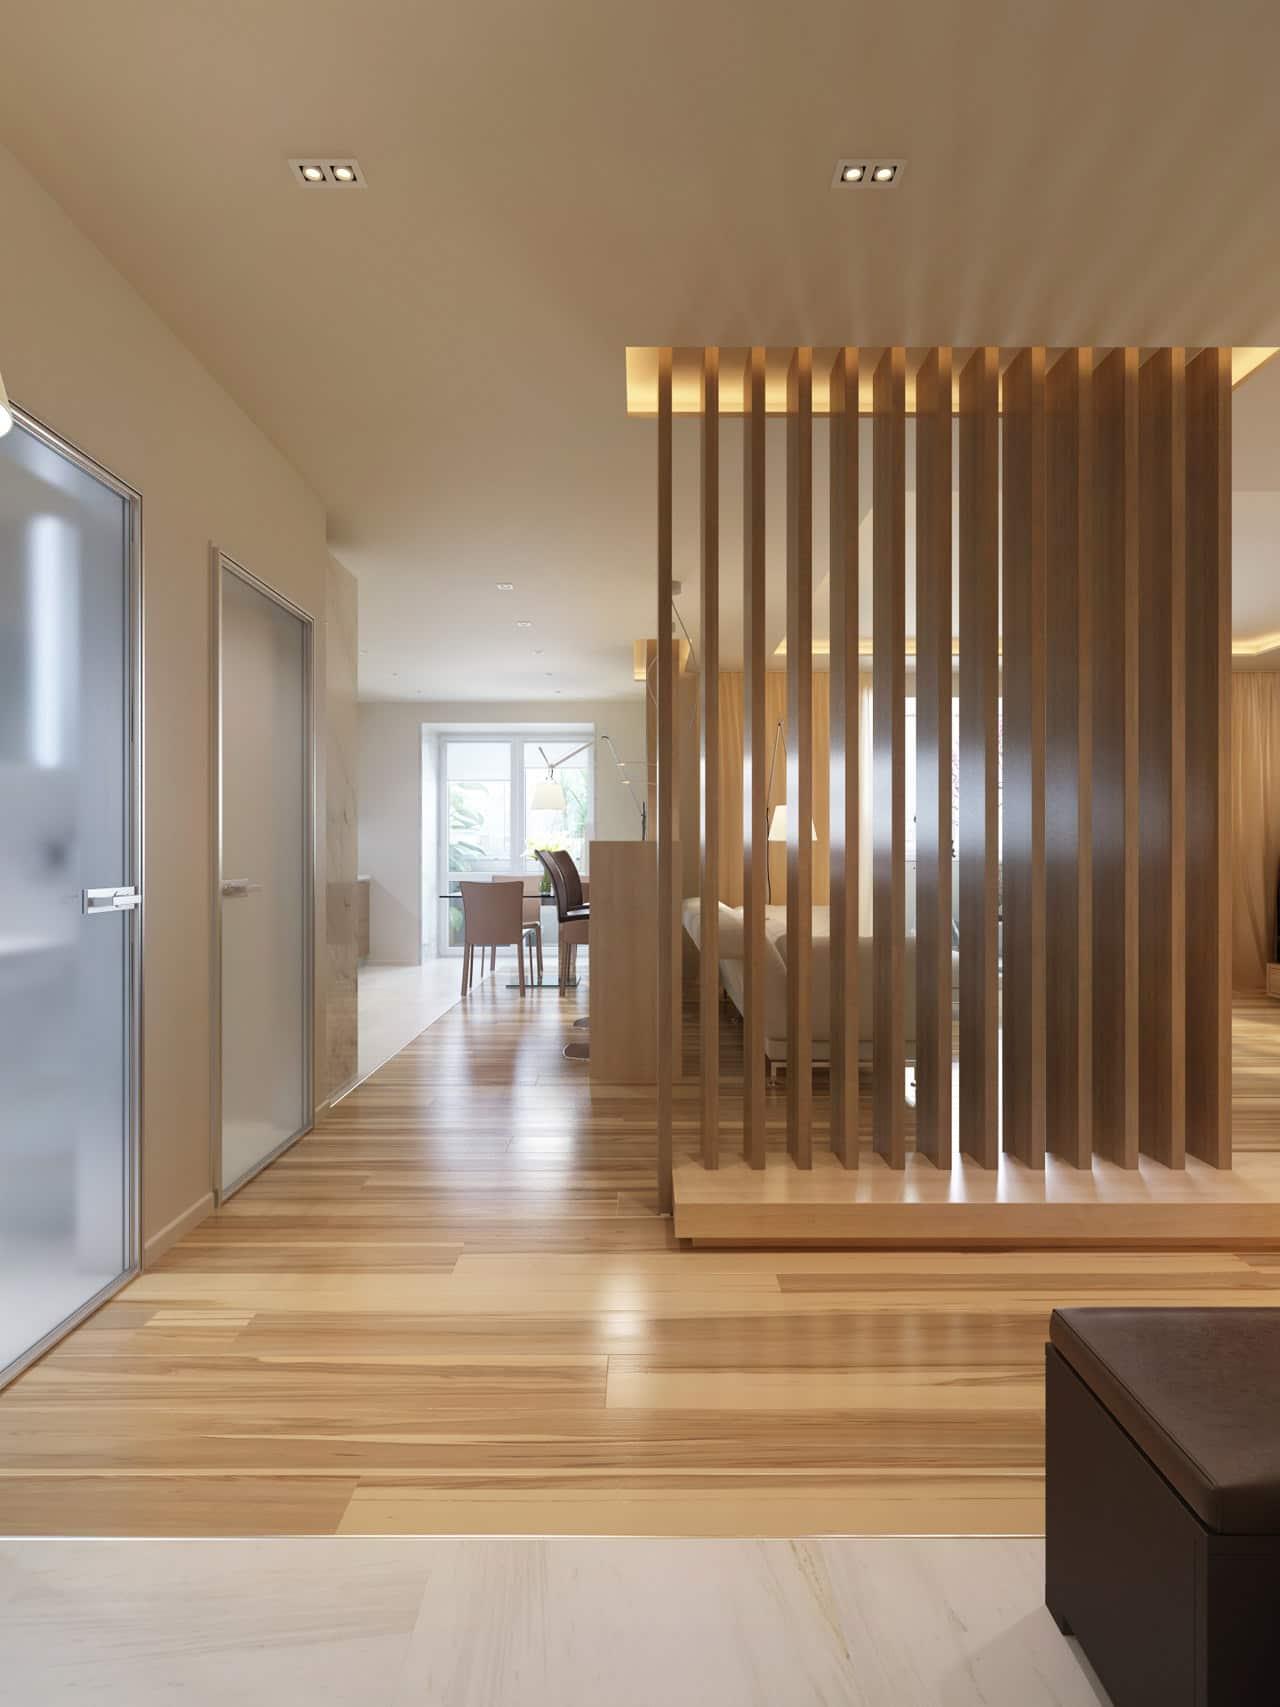 Wooden Slat Divider Wall~ Decorar Interiores Virtual